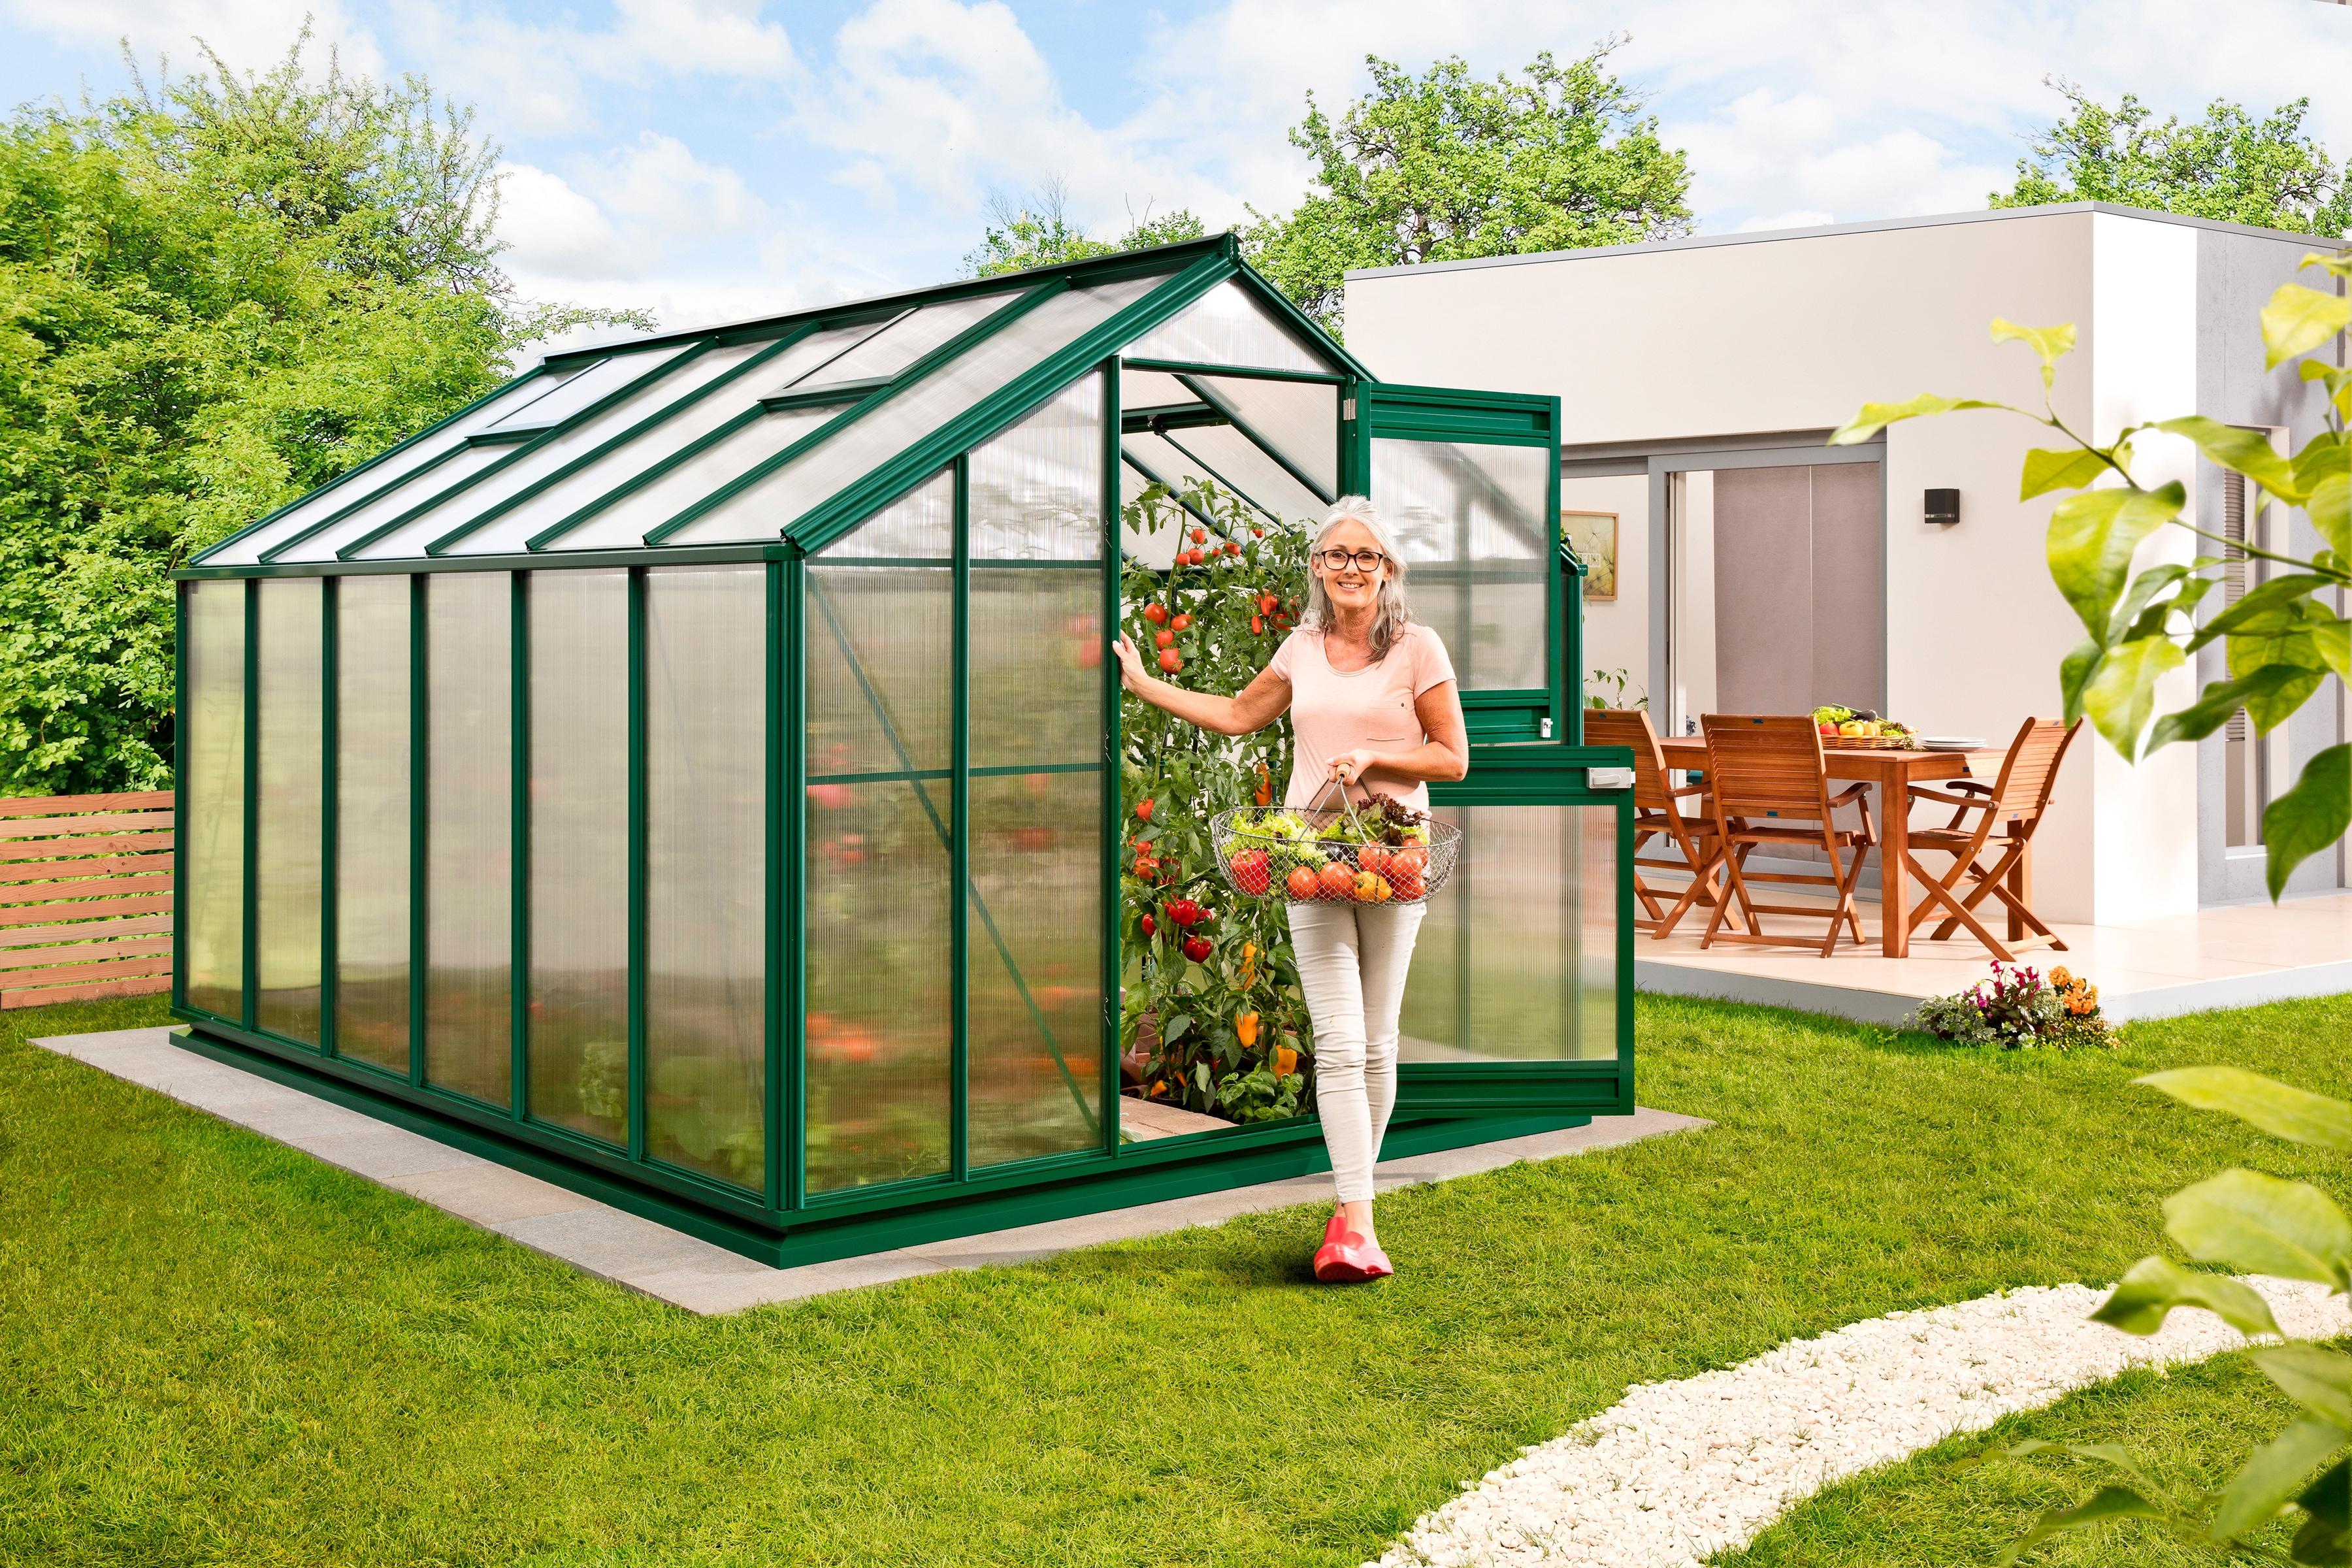 beckmann gew chshaus allg u a10 bxt 256x381cm gr n. Black Bedroom Furniture Sets. Home Design Ideas